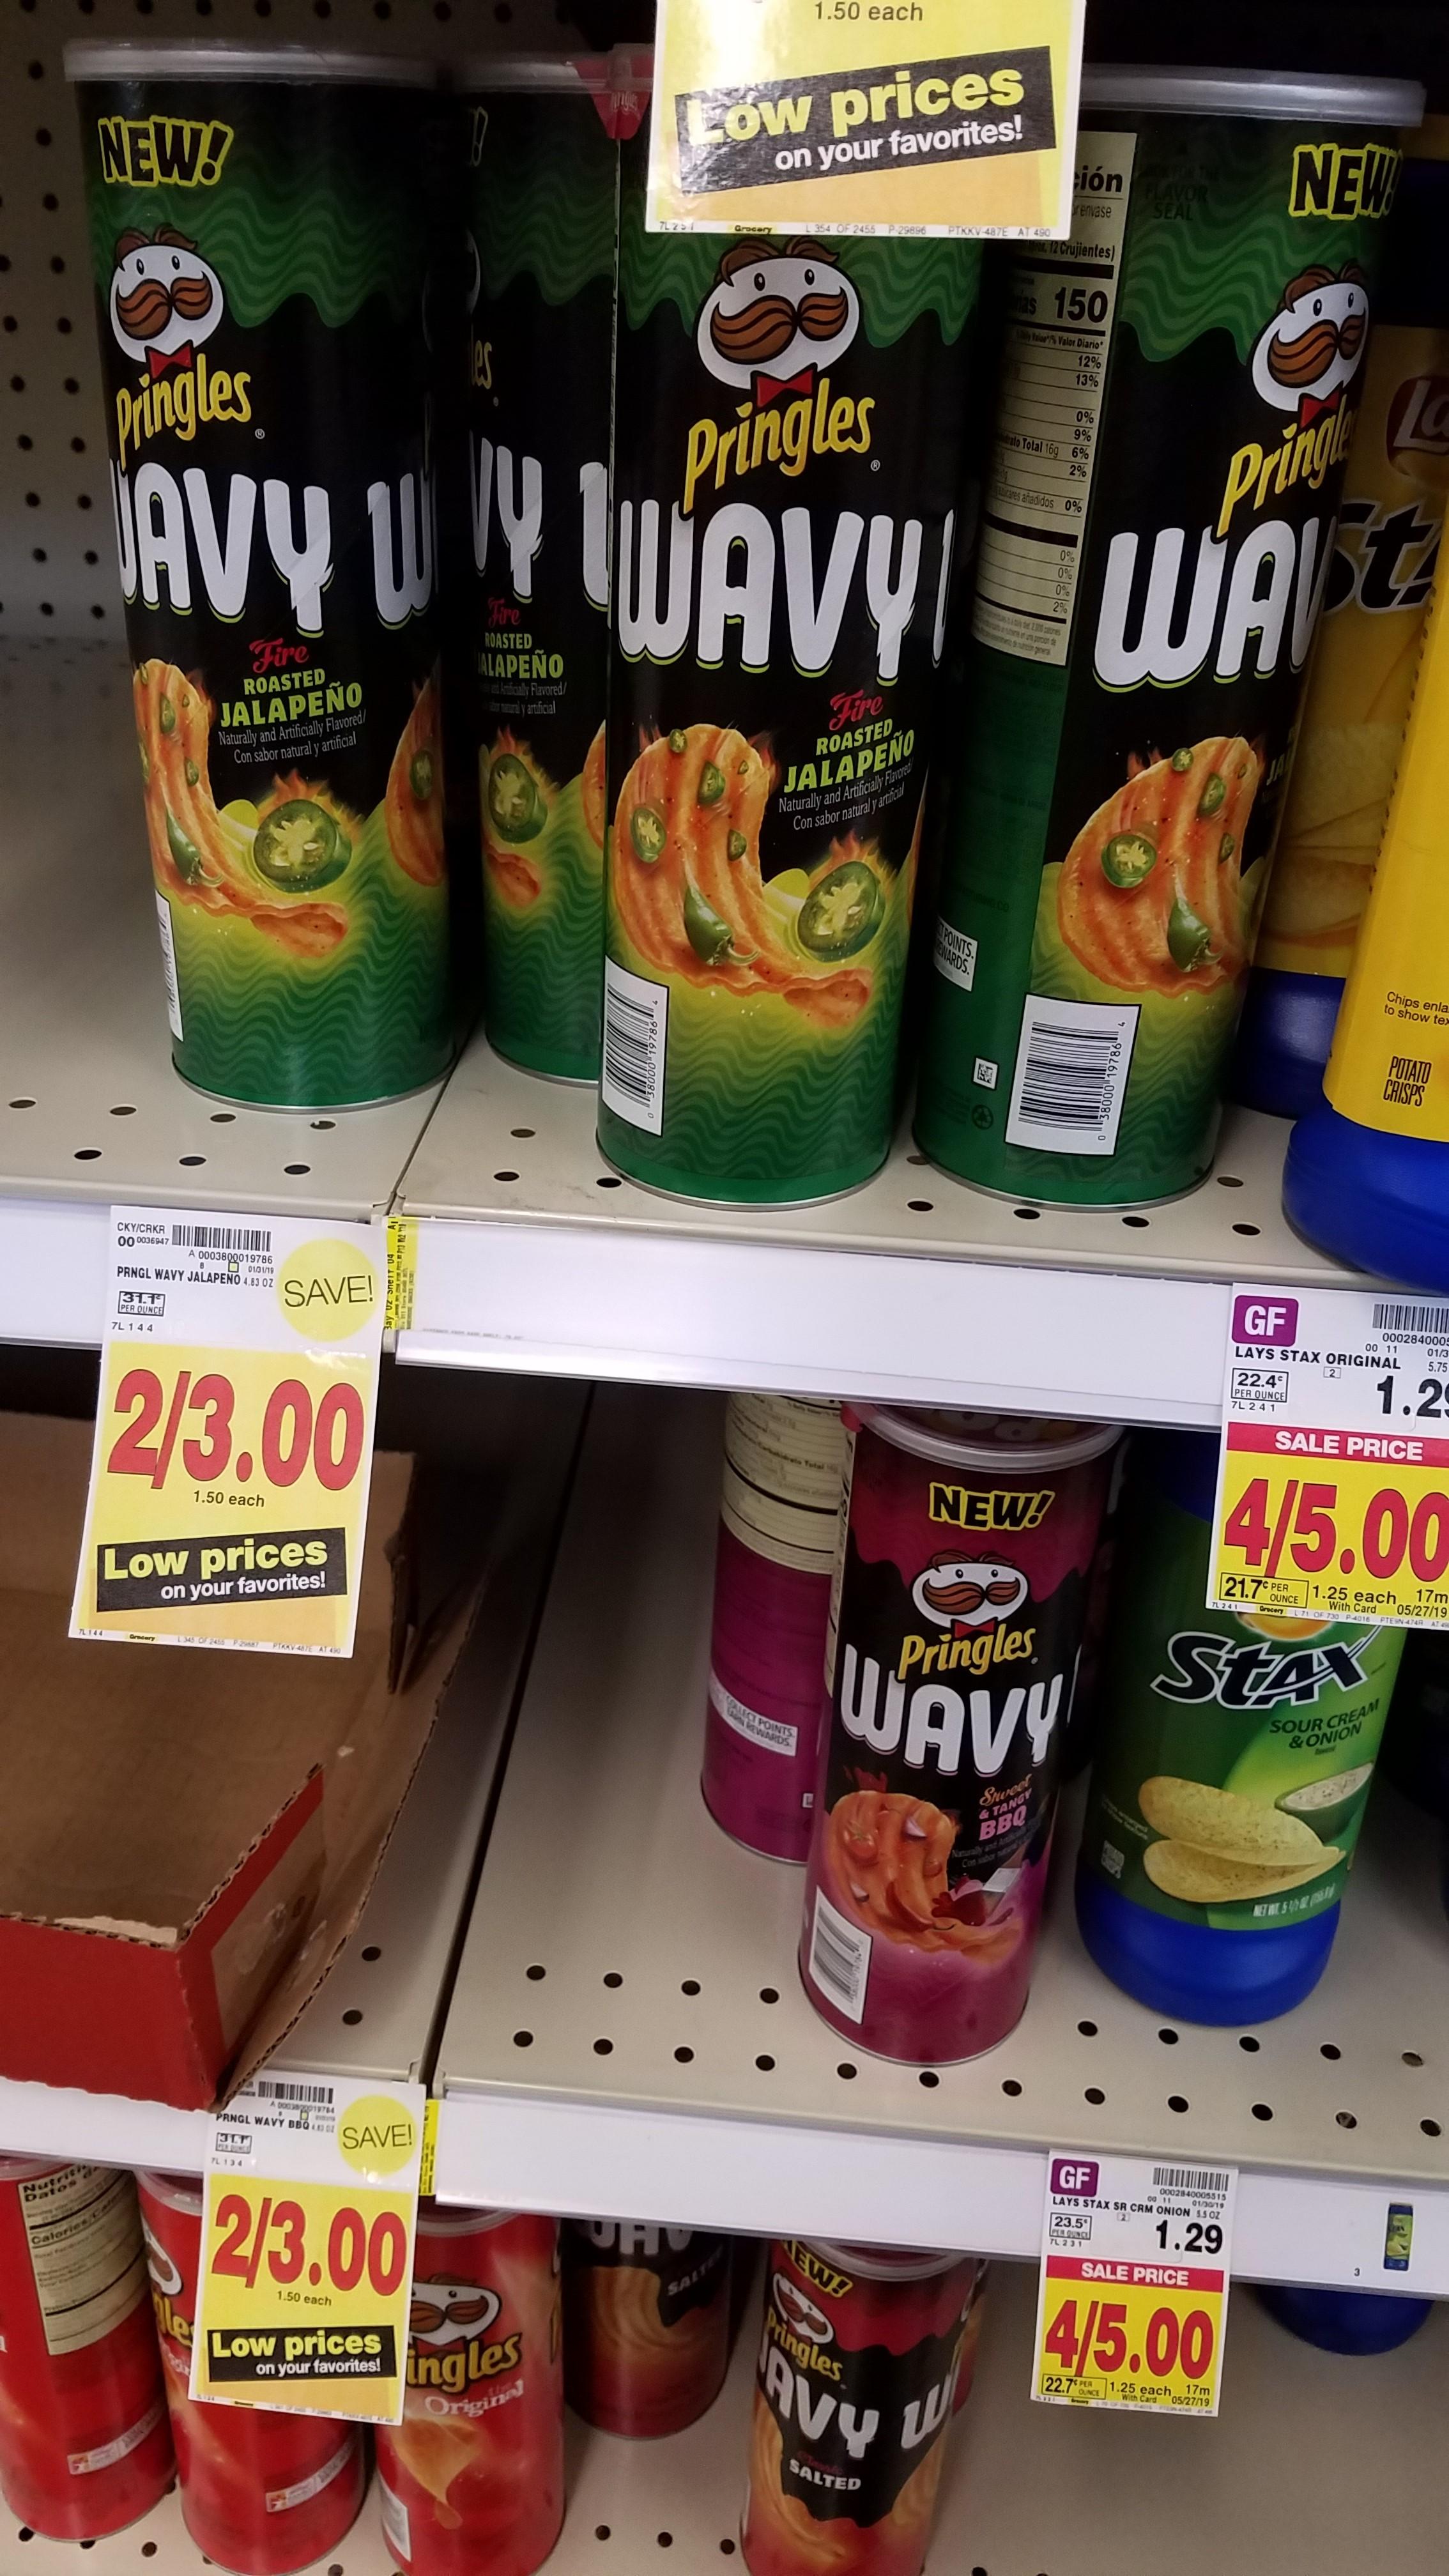 Pringles Wavy just $ 99 - Kroger Couponing